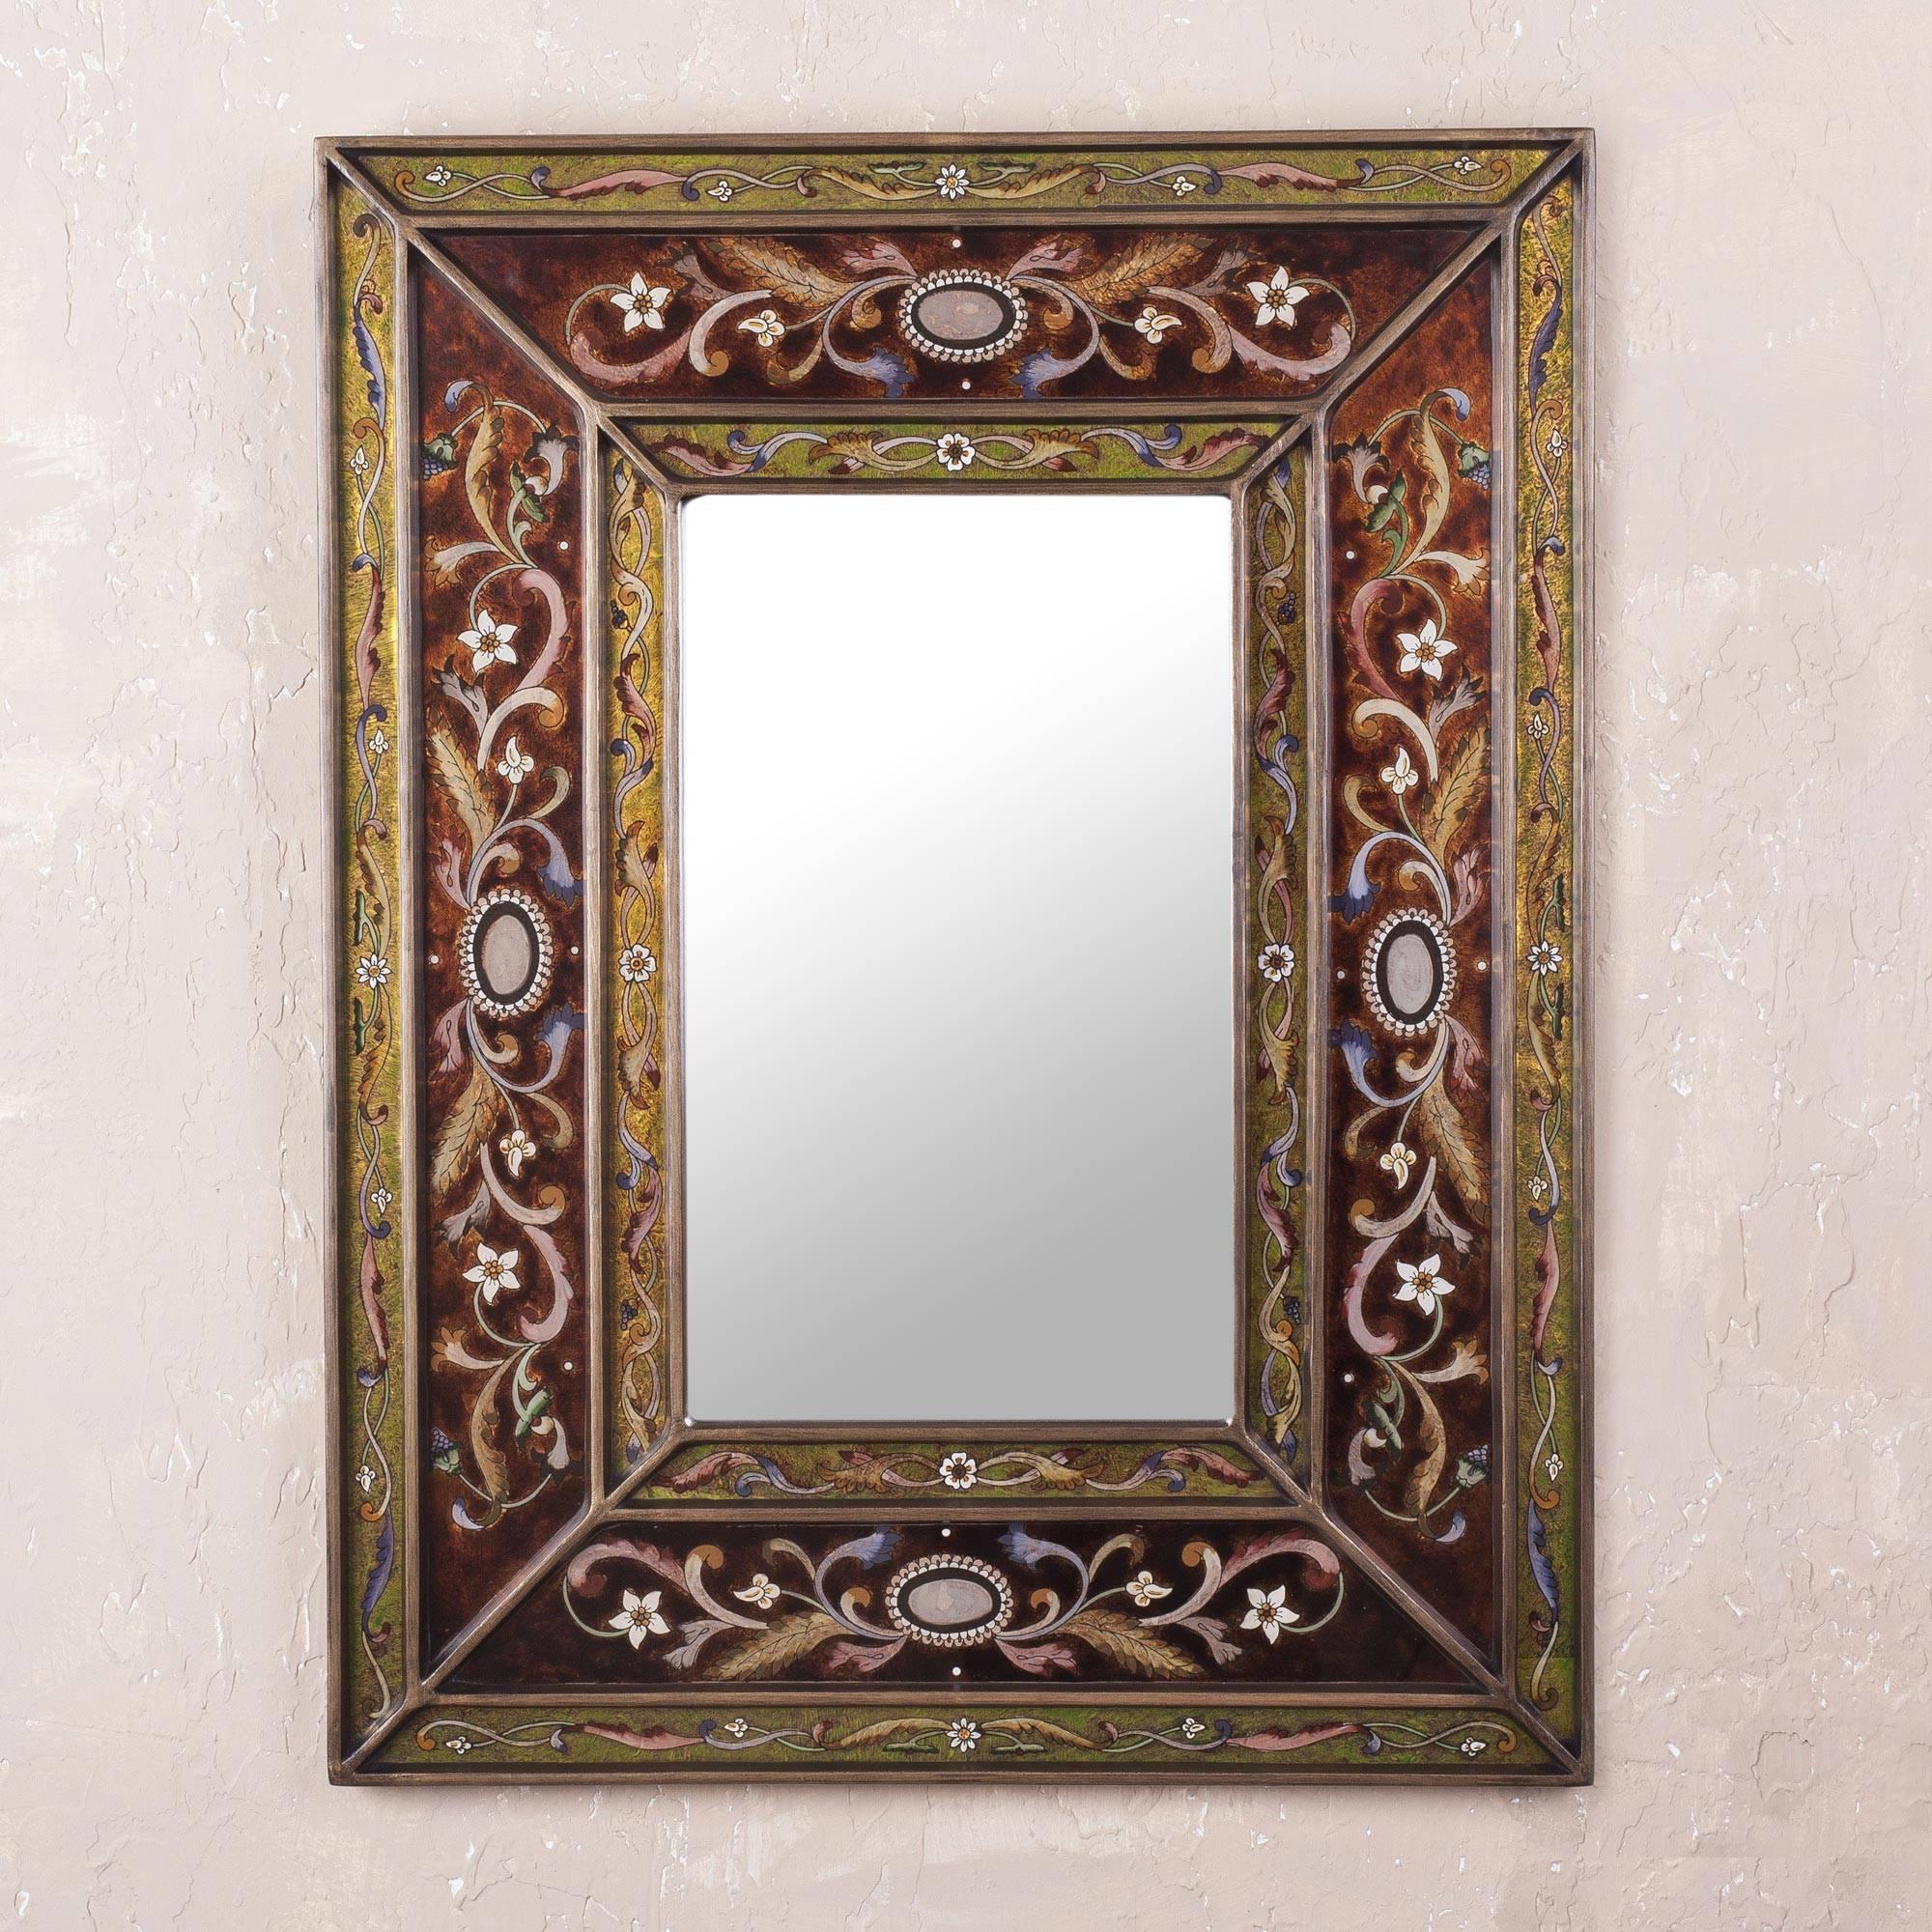 Cajamarca Warmth Rectangular Glass Wall Mirror Reverse Painted from Peru